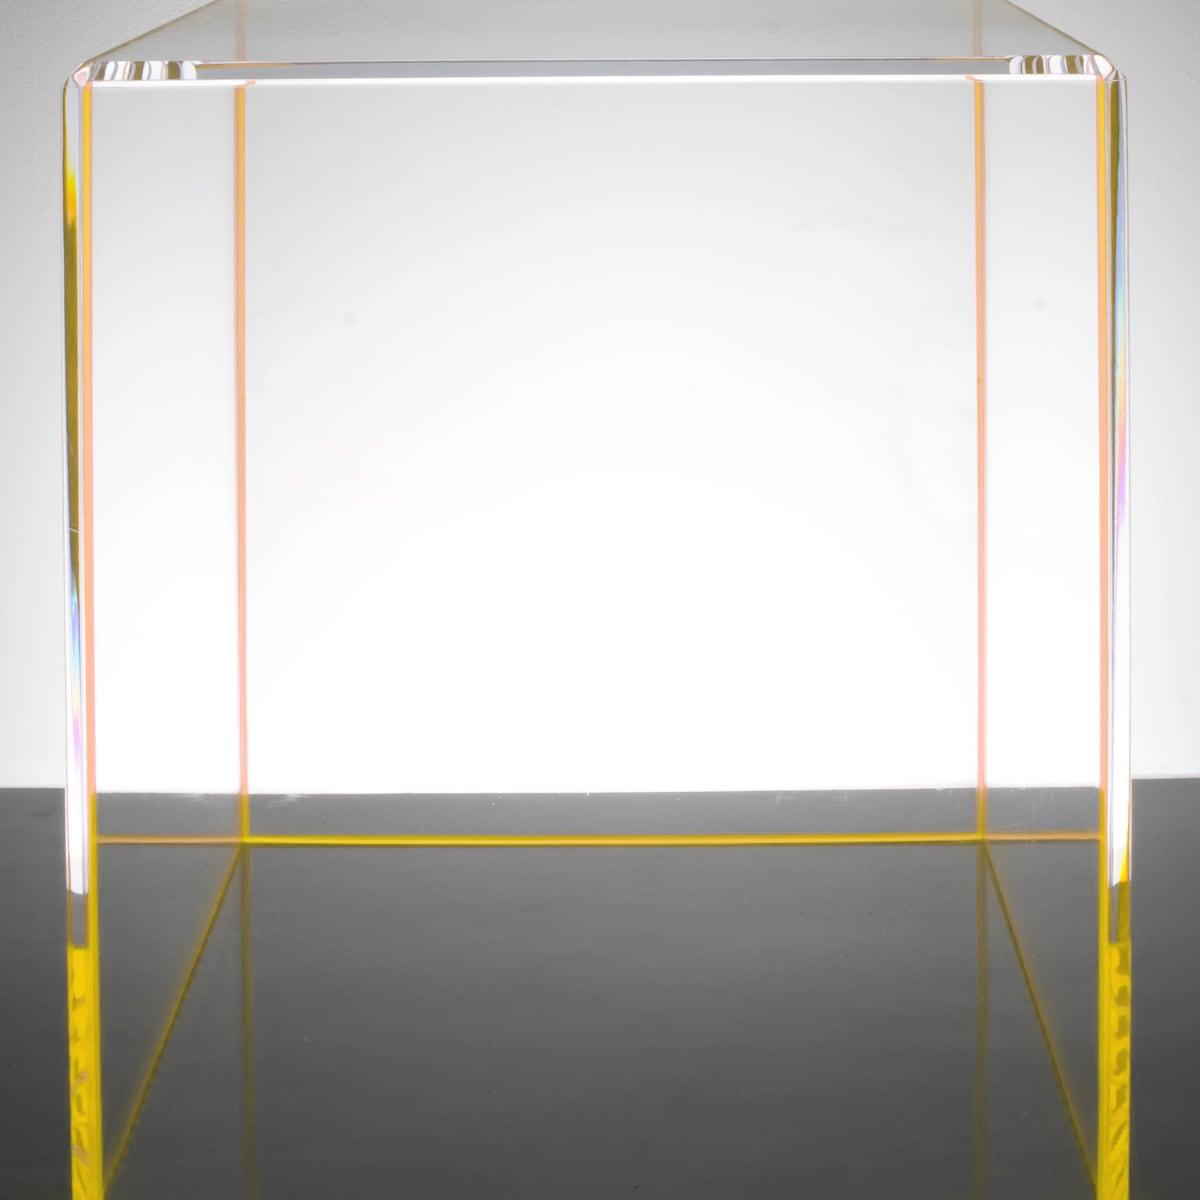 Alexandra von Furstenberg On-the-Rocks yellow end table